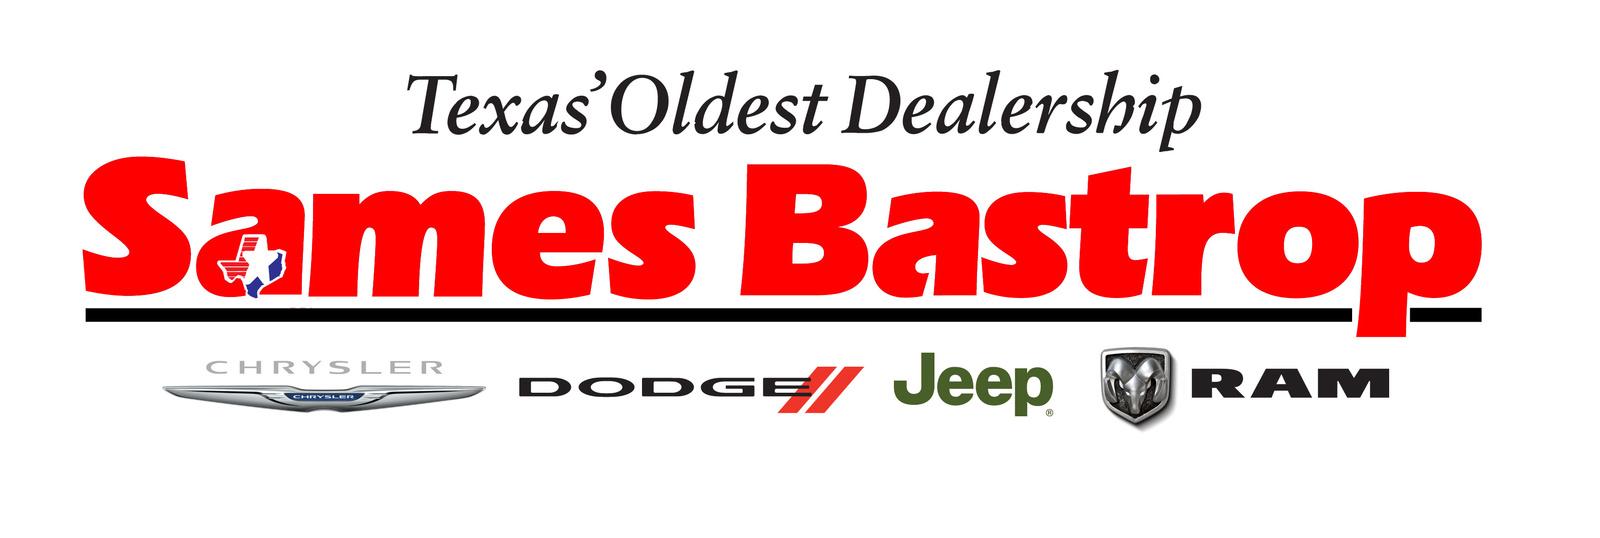 Sames Ford Bastrop >> Sames Bastrop CDJ - Cedar Creek, TX - Reviews & Deals - CarGurus